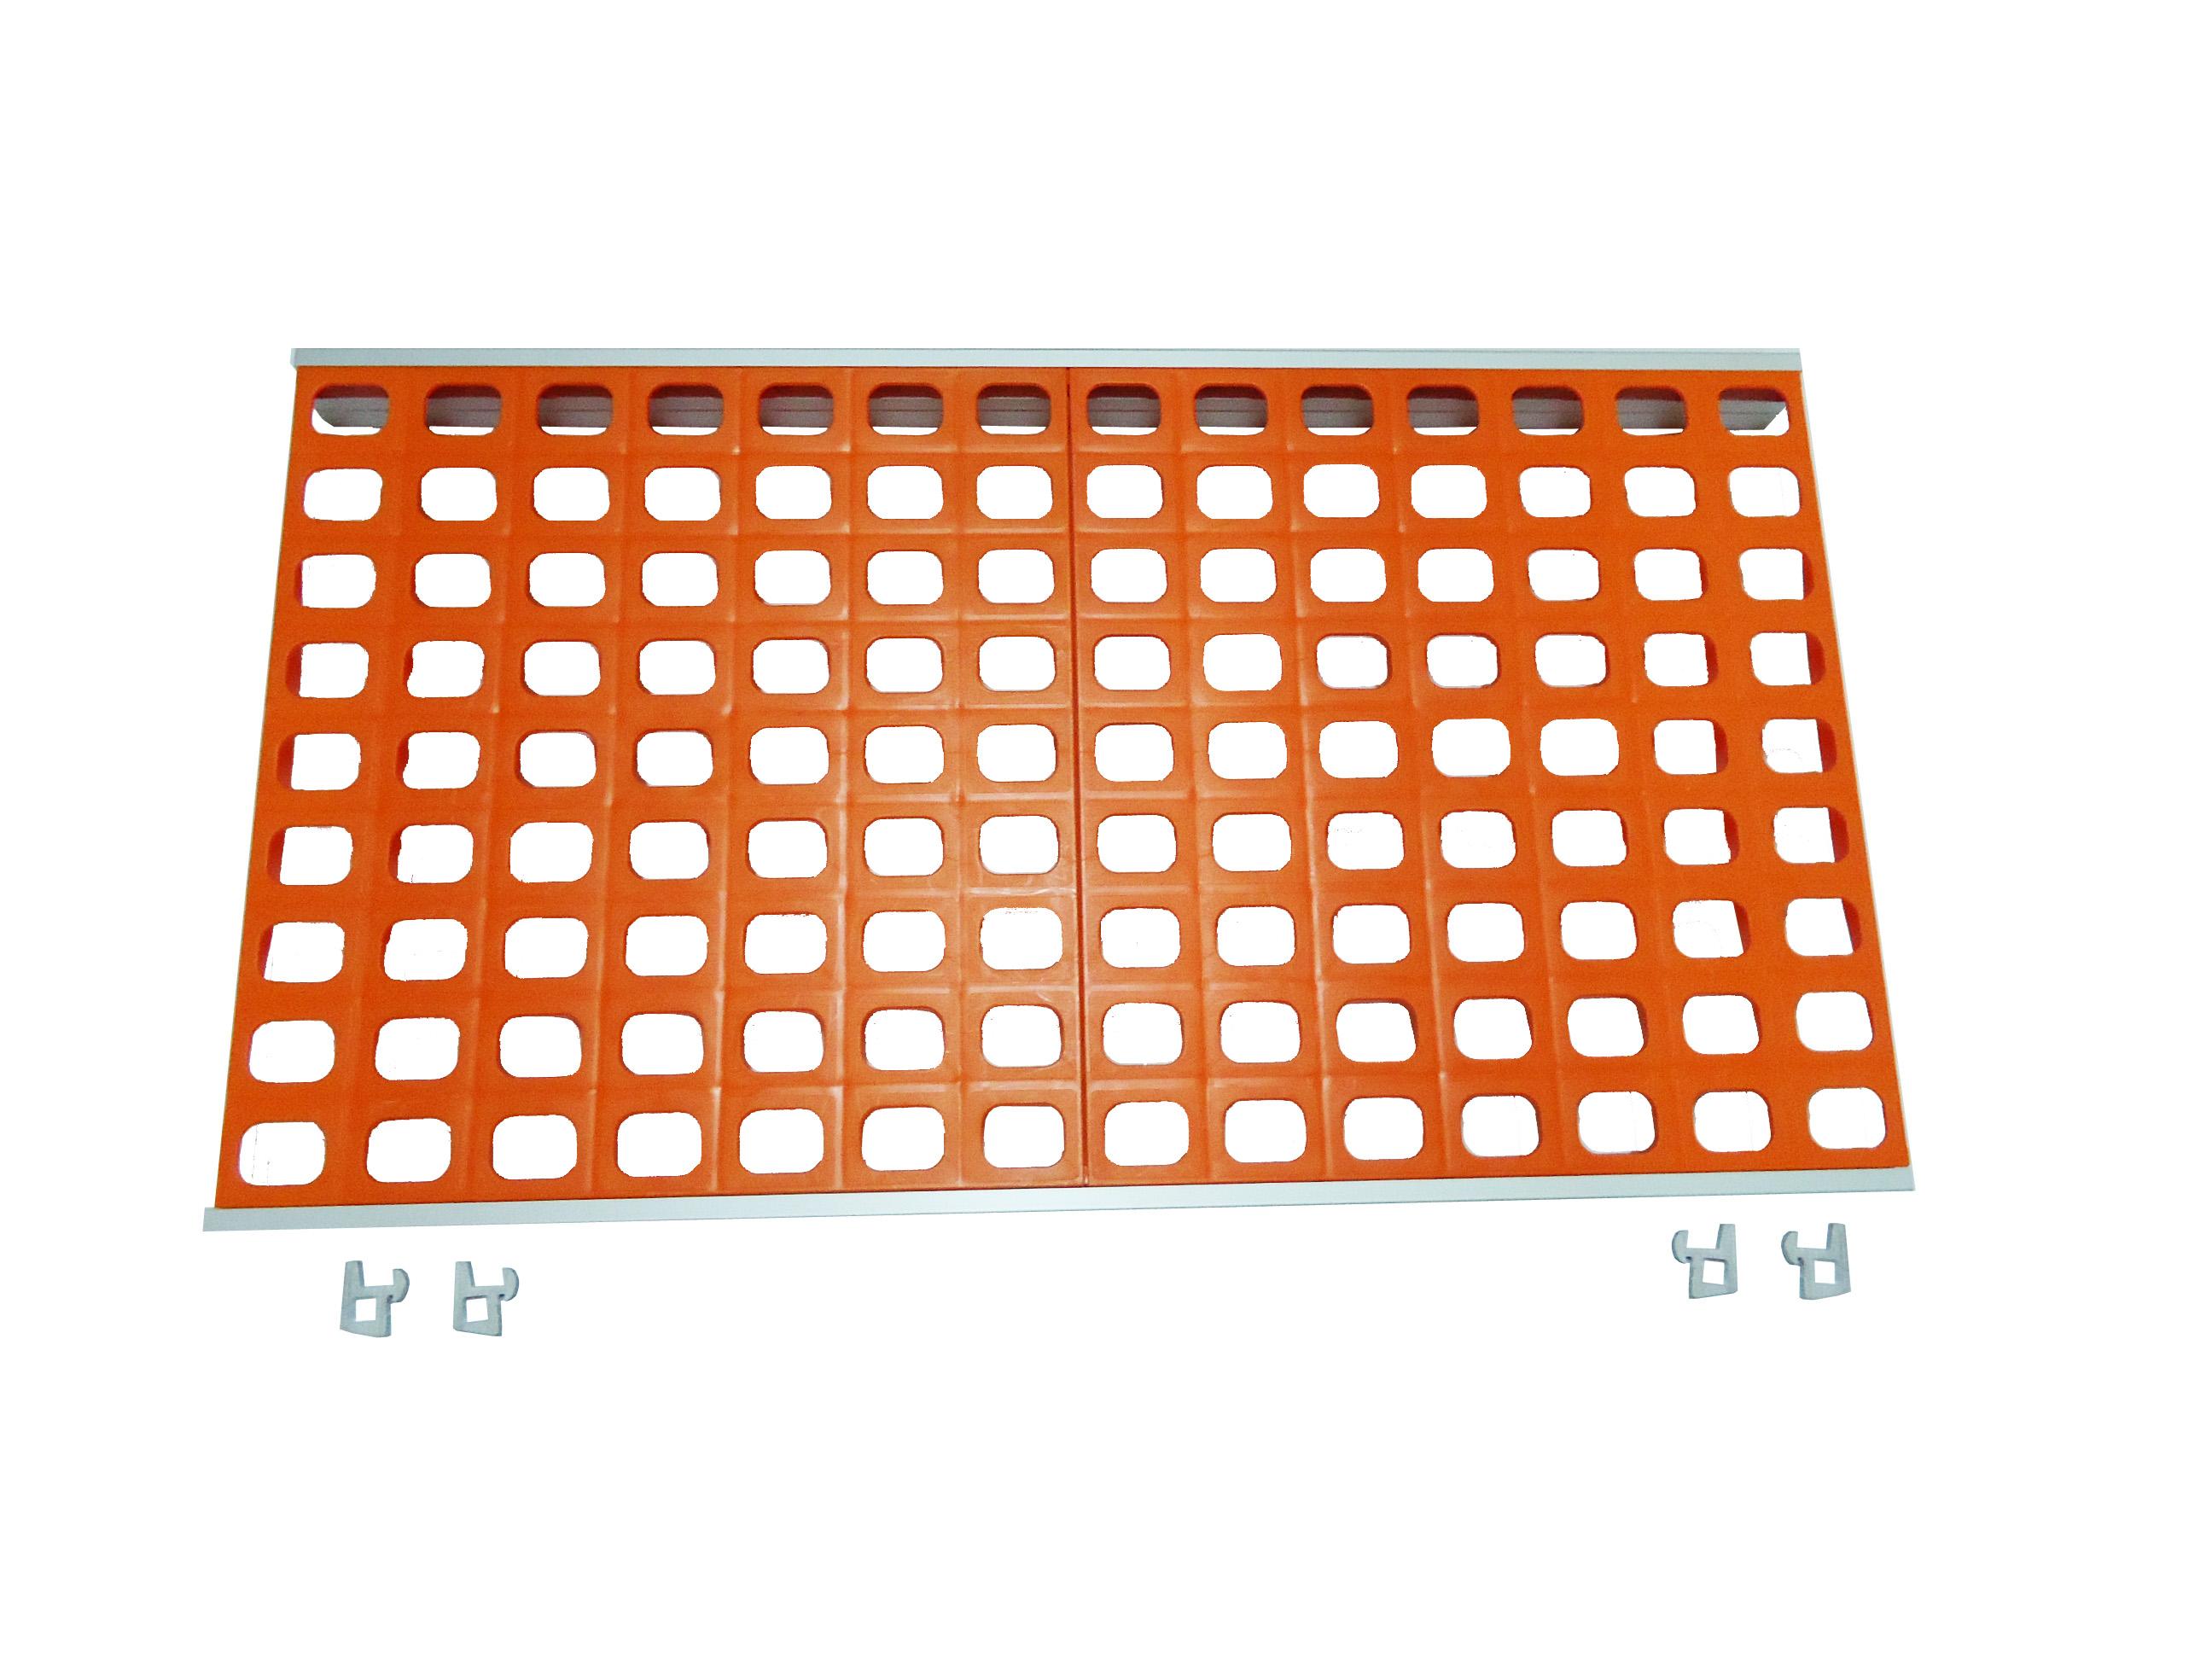 Coolblok KOPA4777C Ραφιέρα - Ράφι Ψυκτικών Θαλάμων Μονό Πολυαιθυλενίου - 770x470 ψυκτικοί θάλαμοι    ράφια ψυκτικών θαλάμων  ψυκτικοί θάλαμοι    ράφια ψυκτικών θ